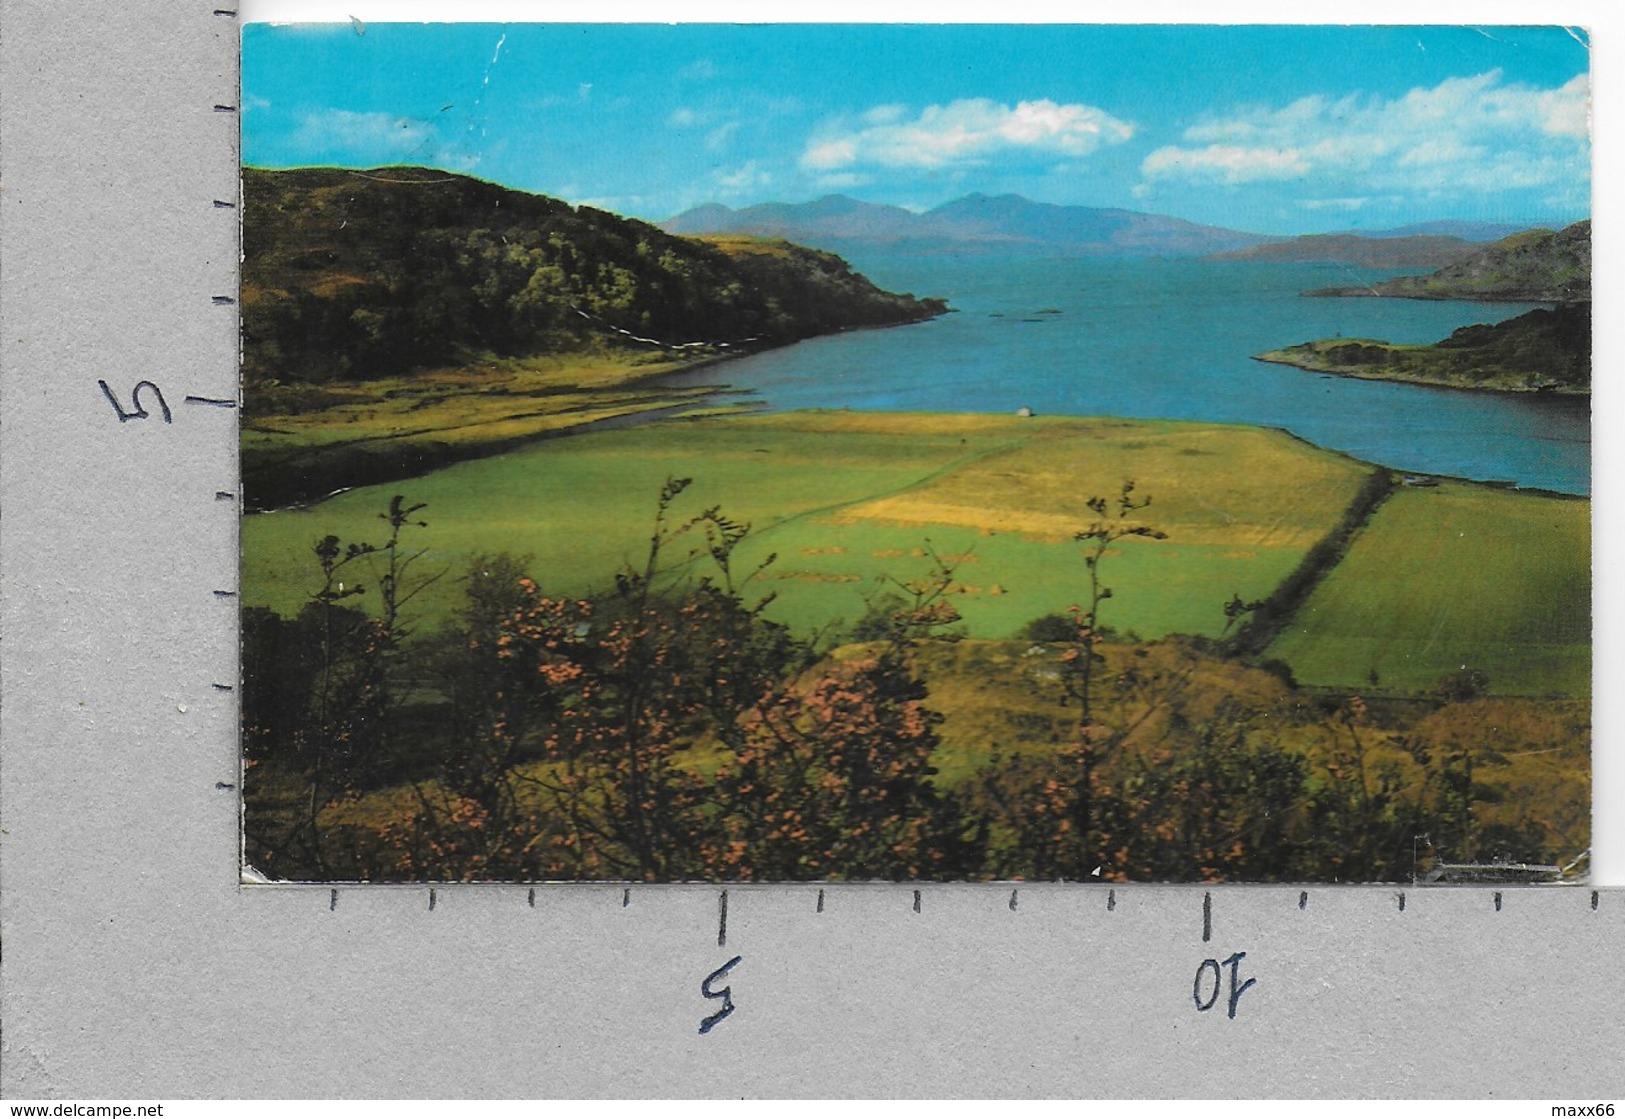 CARTOLINA VG REGNO UNITO - The Isle Of MULL From Loch Feochan - 9 X 14 - ANN. 1973 - Argyllshire